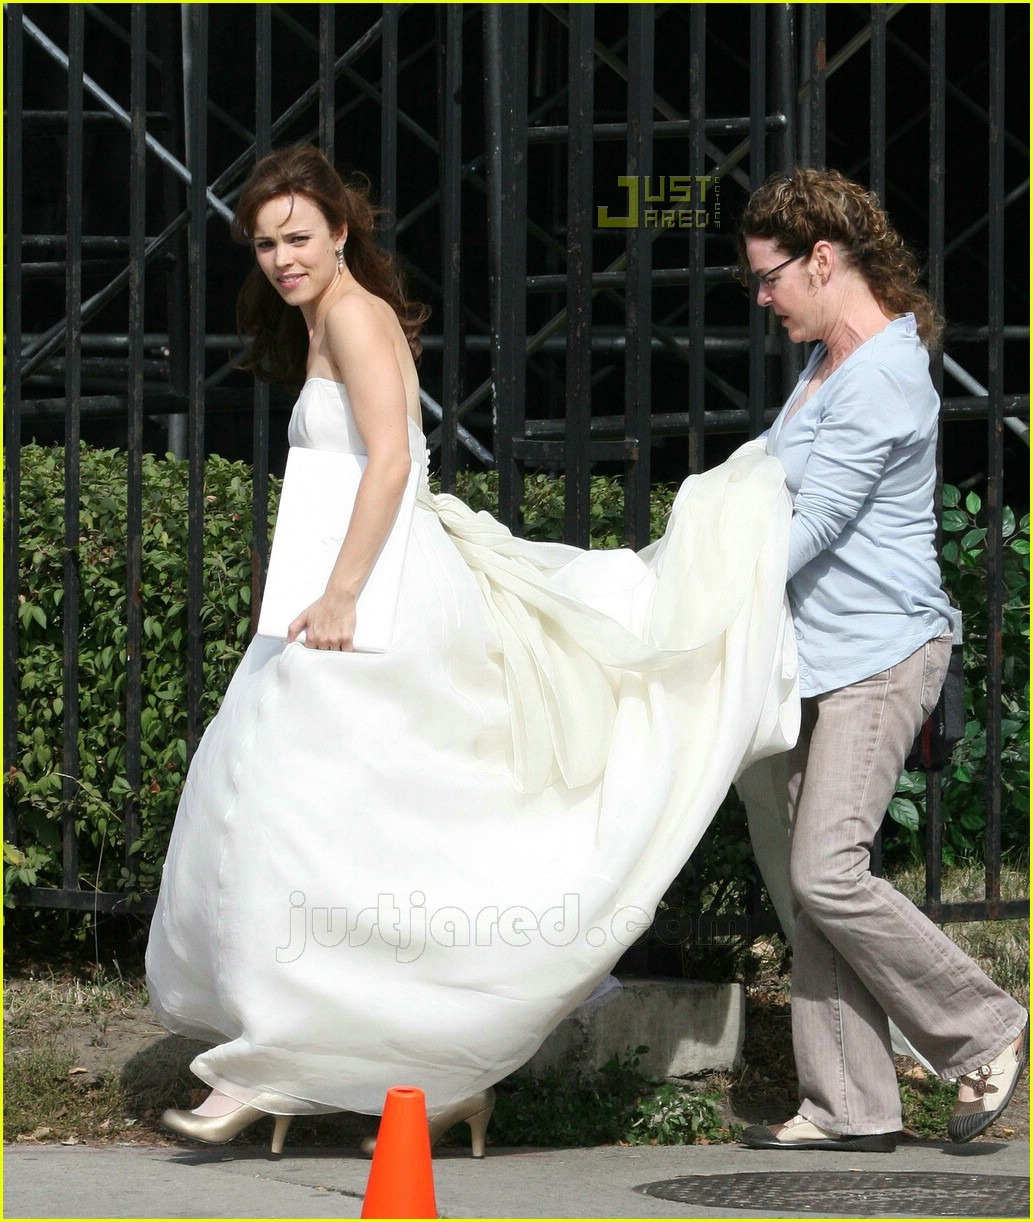 Rachel McAdams\' Wedding Dress: Photo 624341 | Celebrity Babies, Eric ...